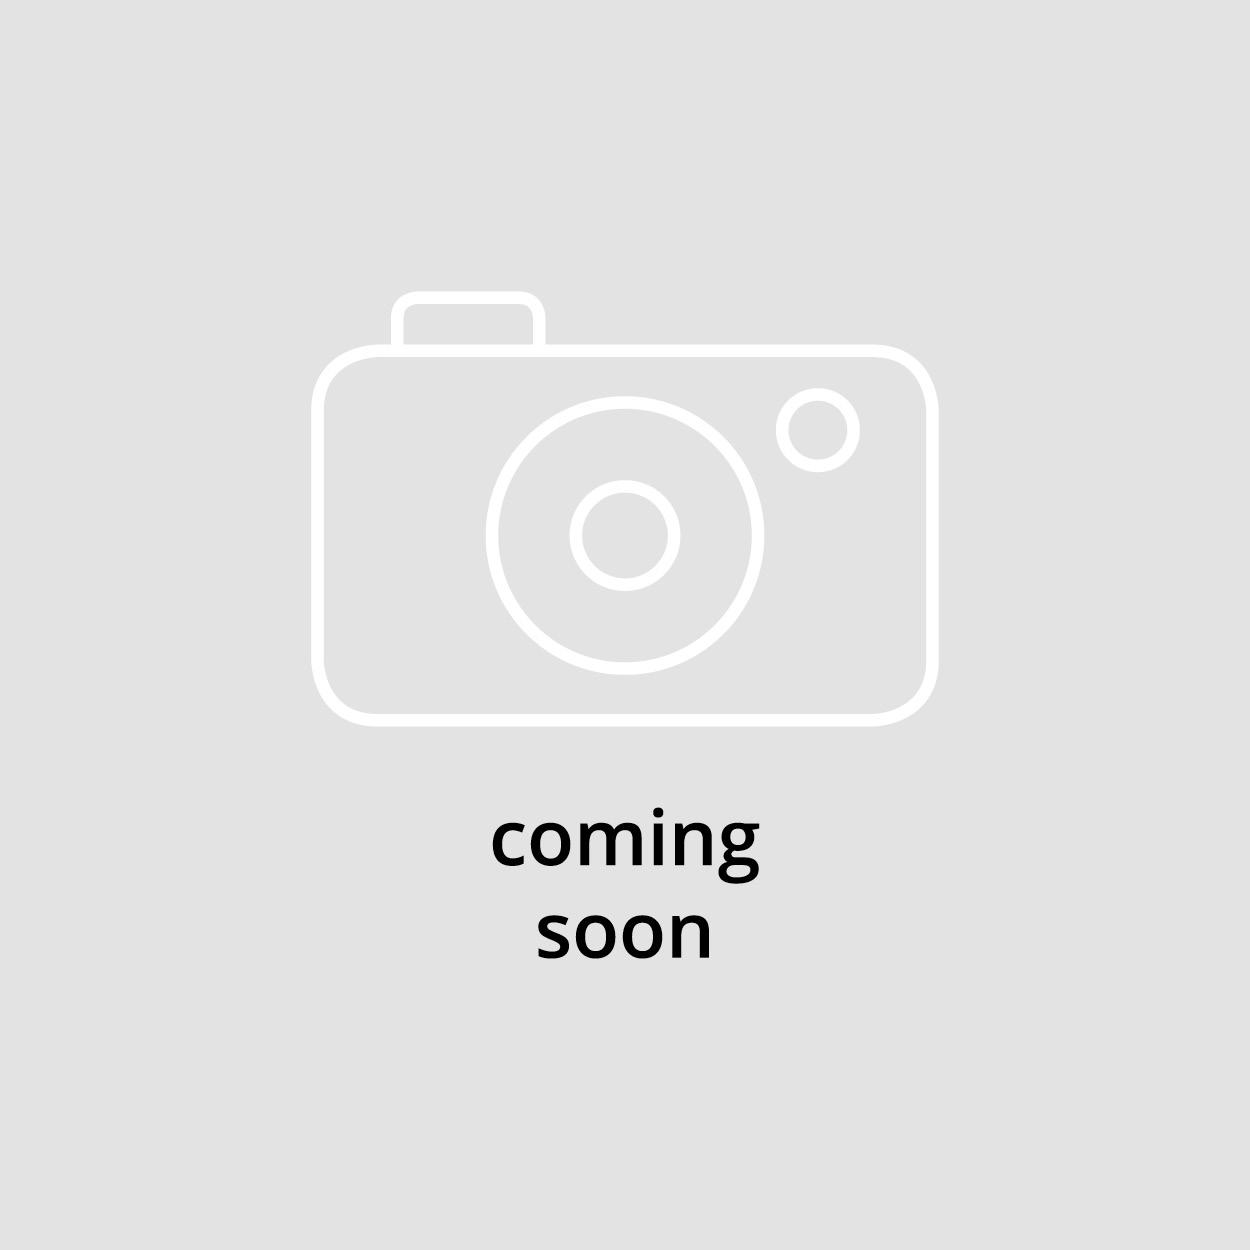 05.14.007 Tirante per biella regolabile mandrini frontali Gildemeister AS16, AS20, GS20, GM20, GM20AC